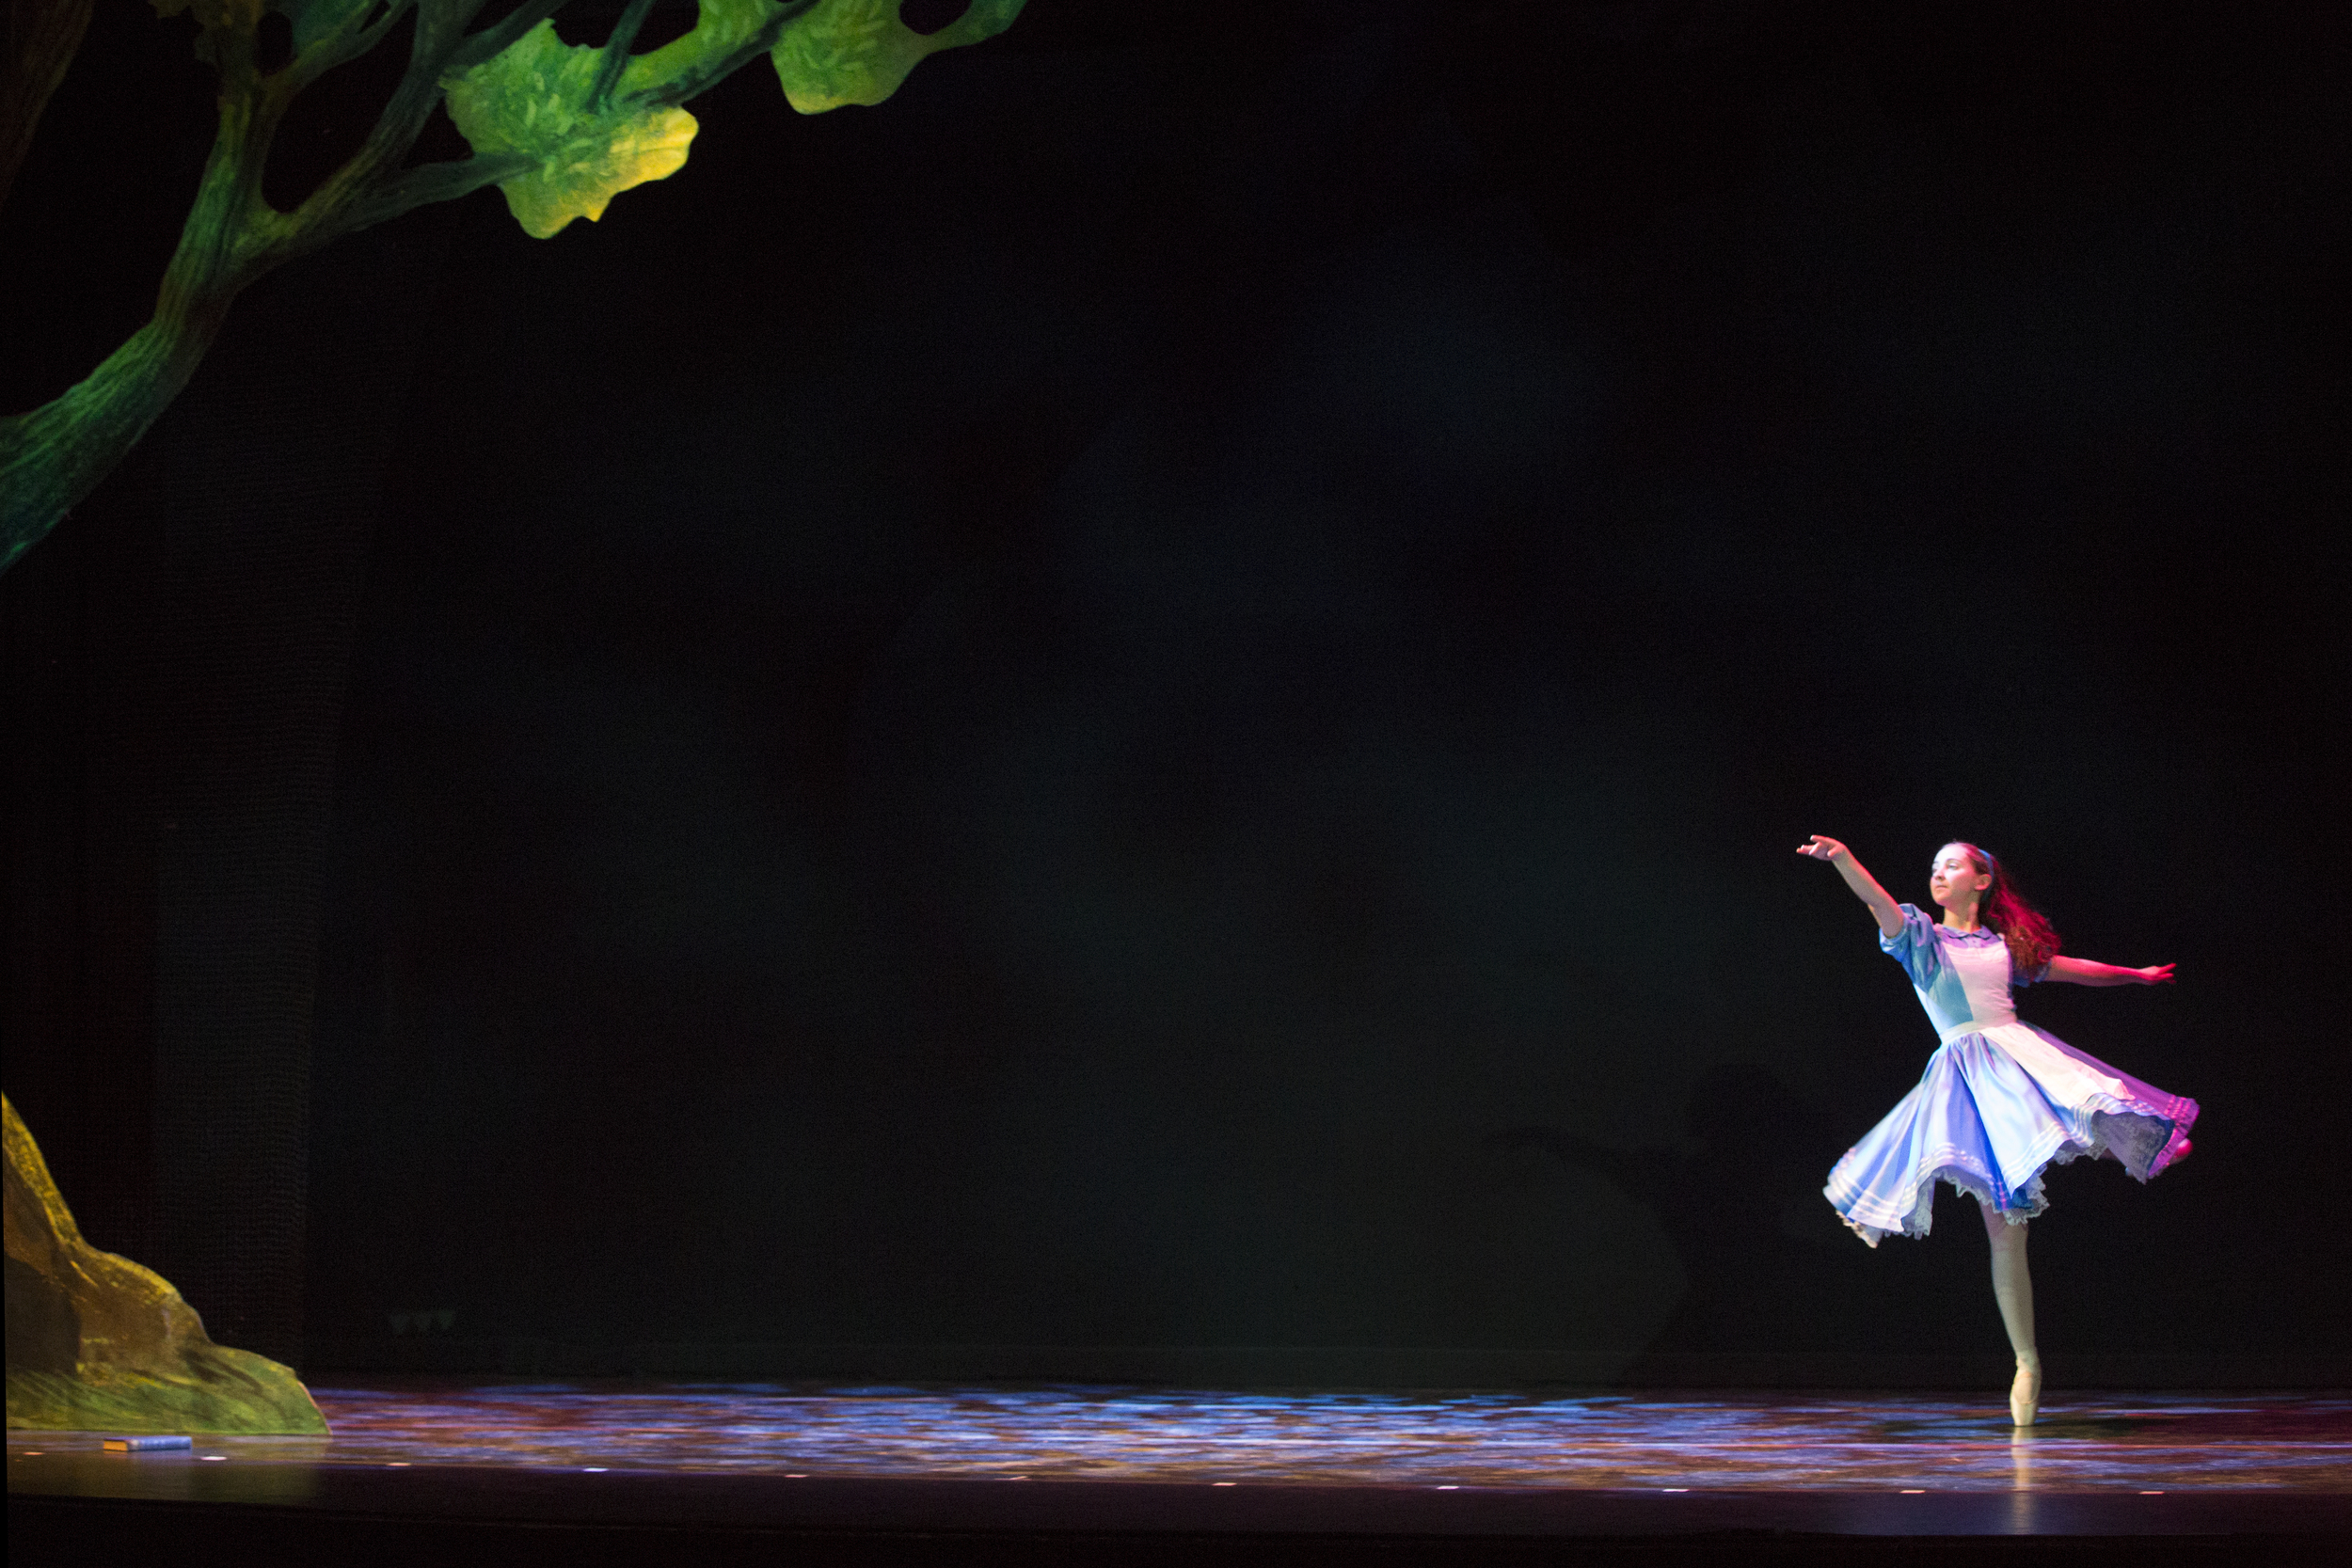 20150406-vn-ballet-ss-232.jpg